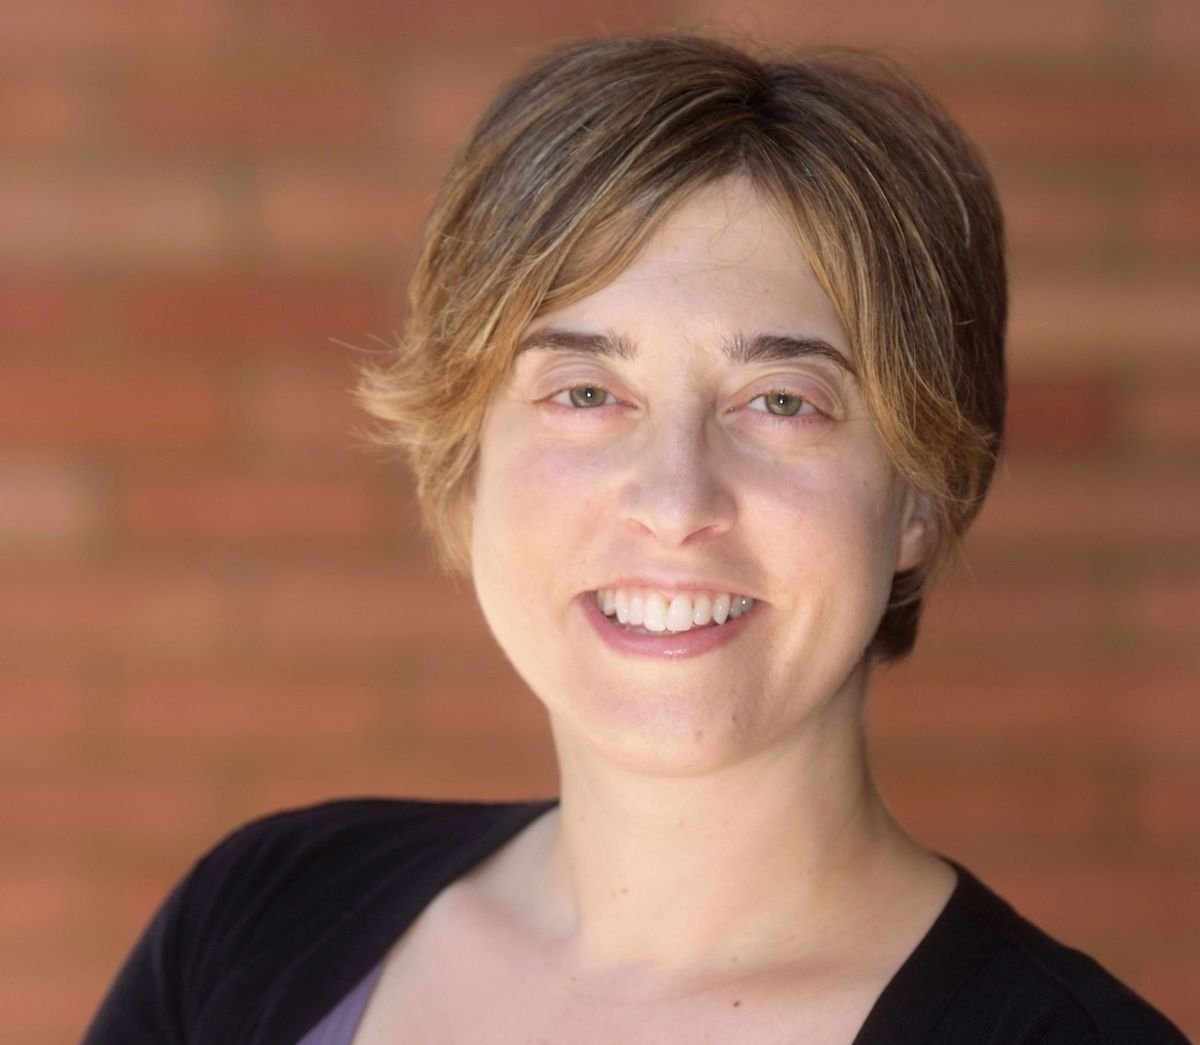 Sharon Dolovich